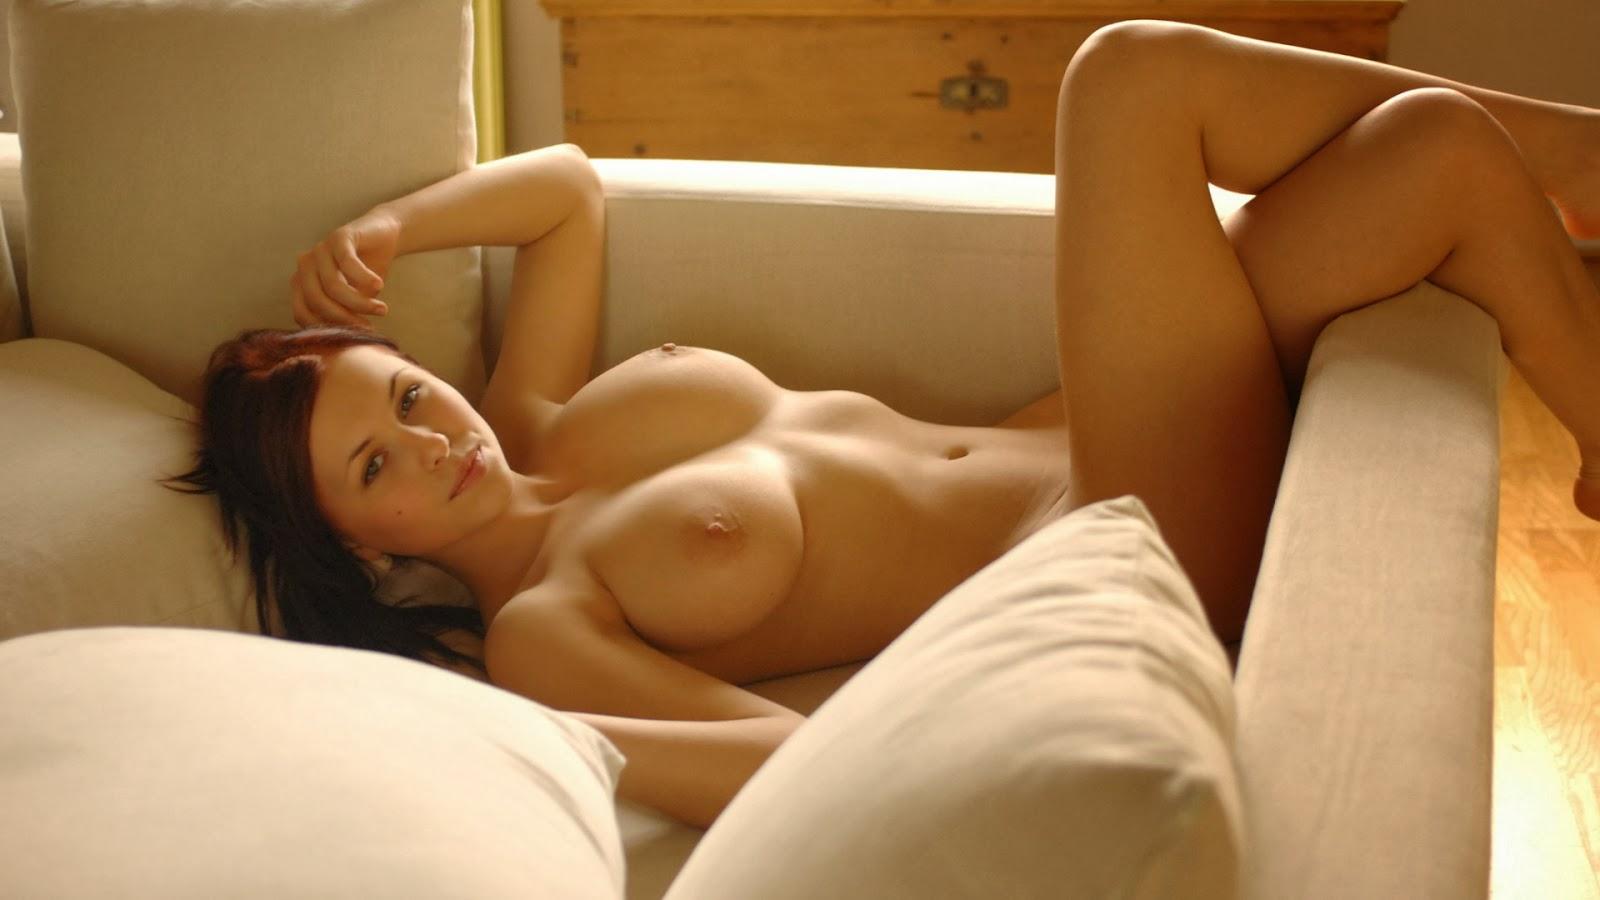 Eve Wyrwal Sensual Erotic Naked Woman